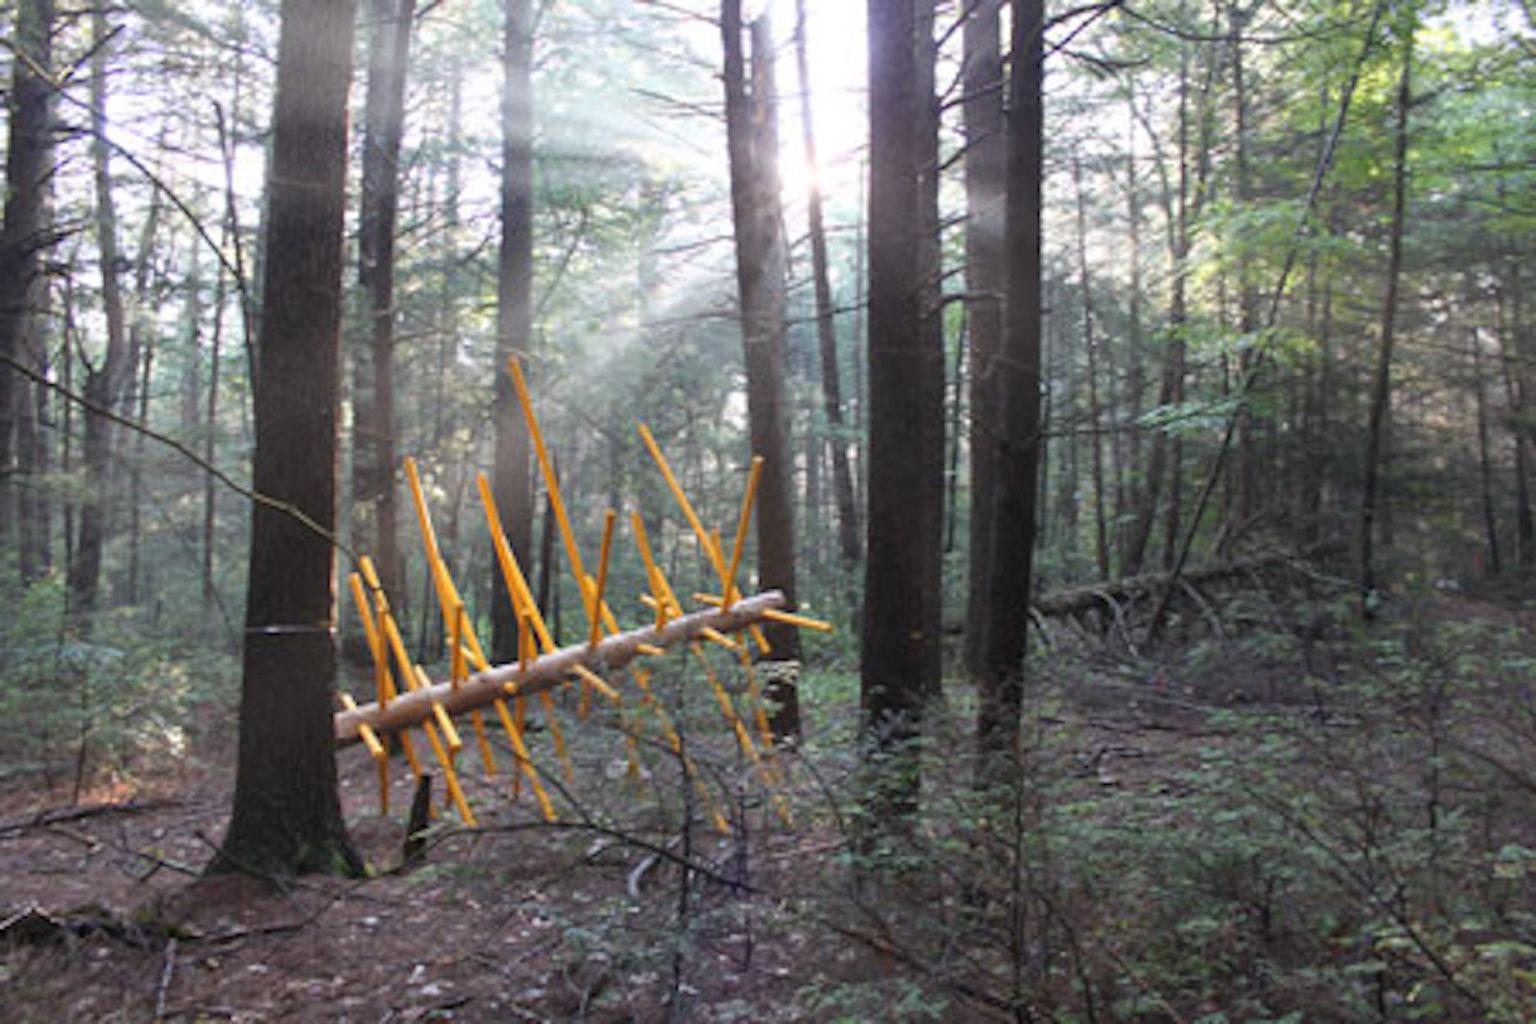 Exchange Tree, by David Buckley Borden. 2017.